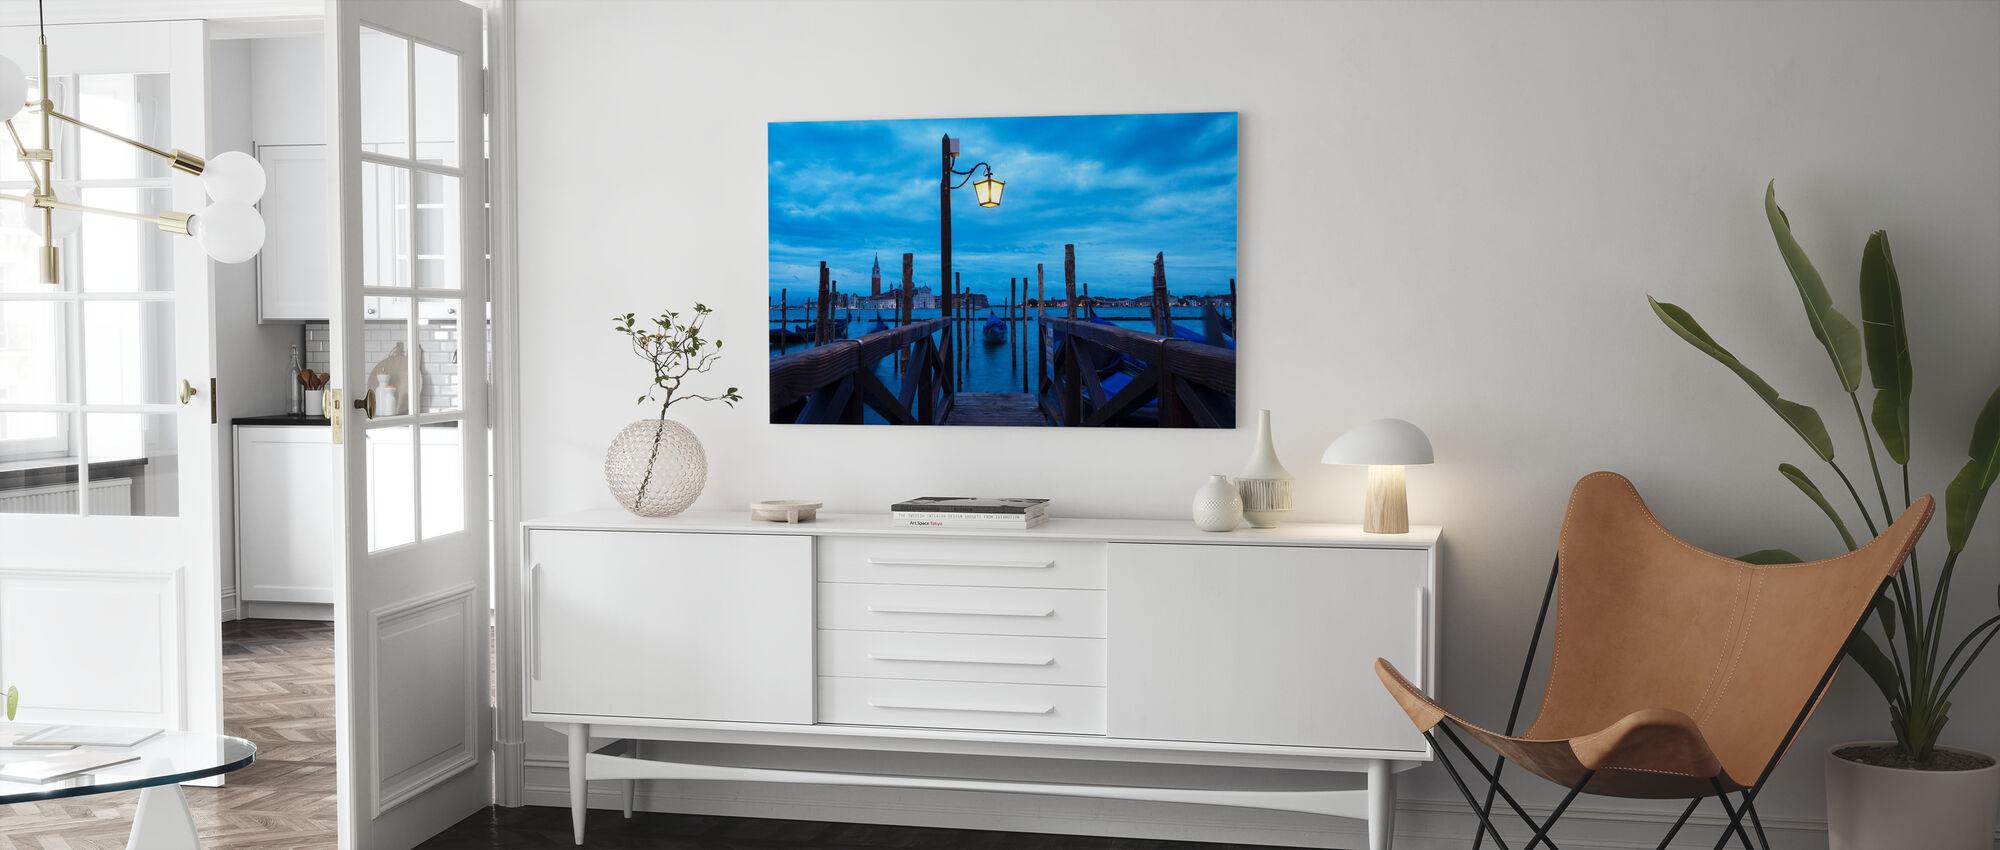 Venice Italy Pier - Canvas print - Living Room